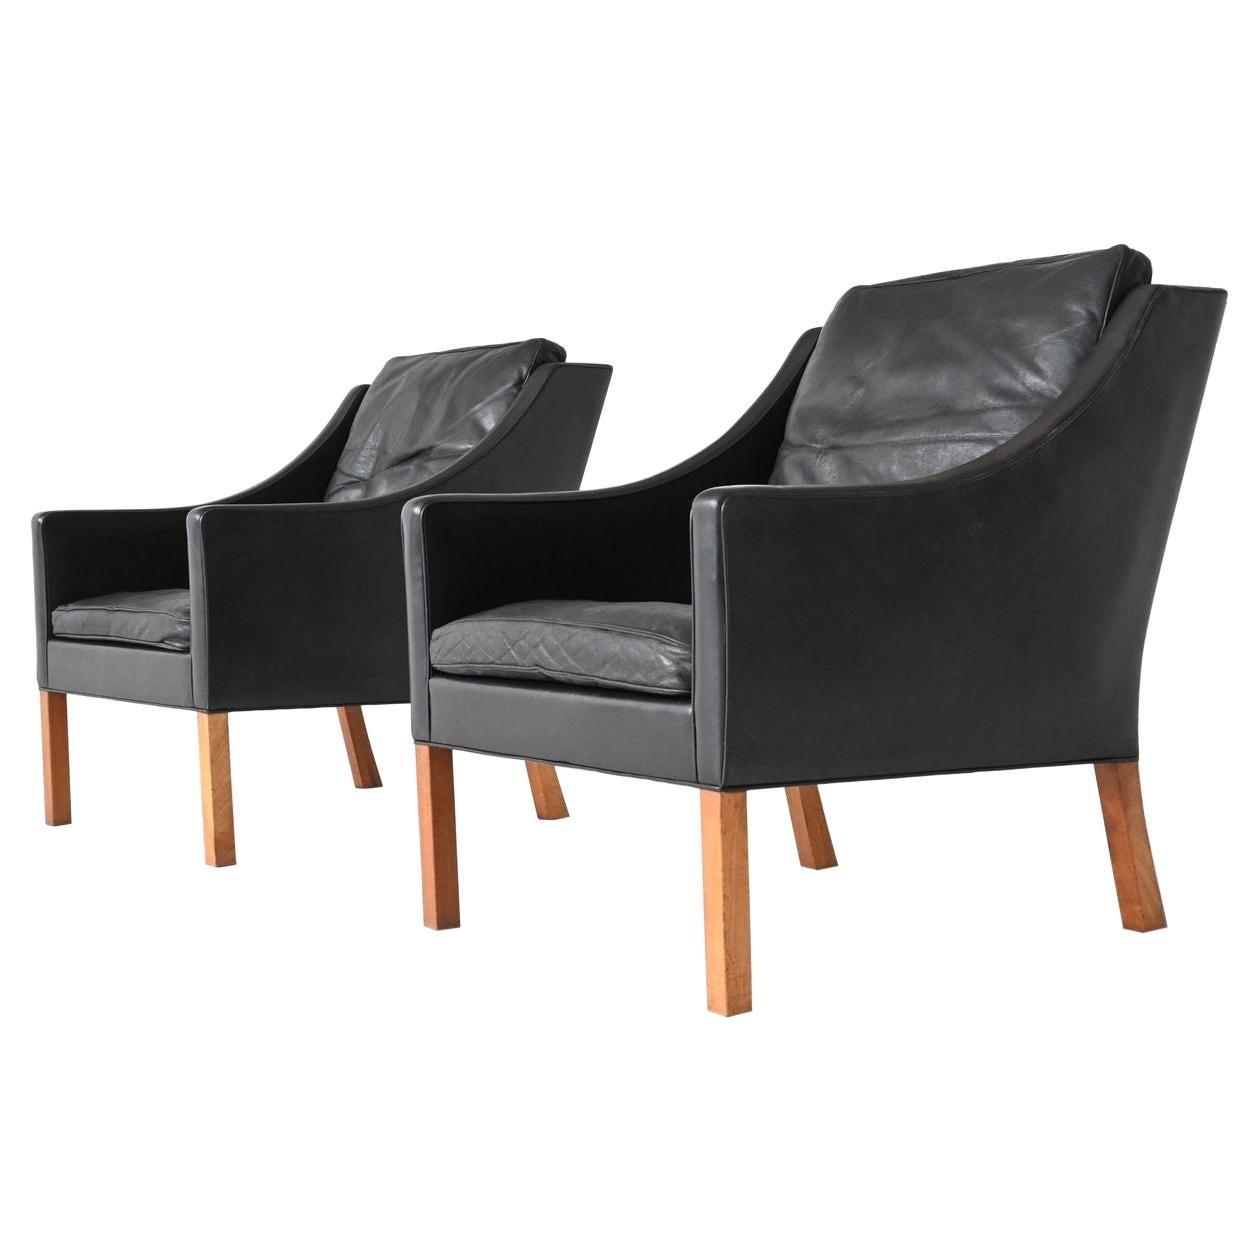 Borge Mogensen Lounge Chairs Fredericia Stolefabrik, Denmark, 1963